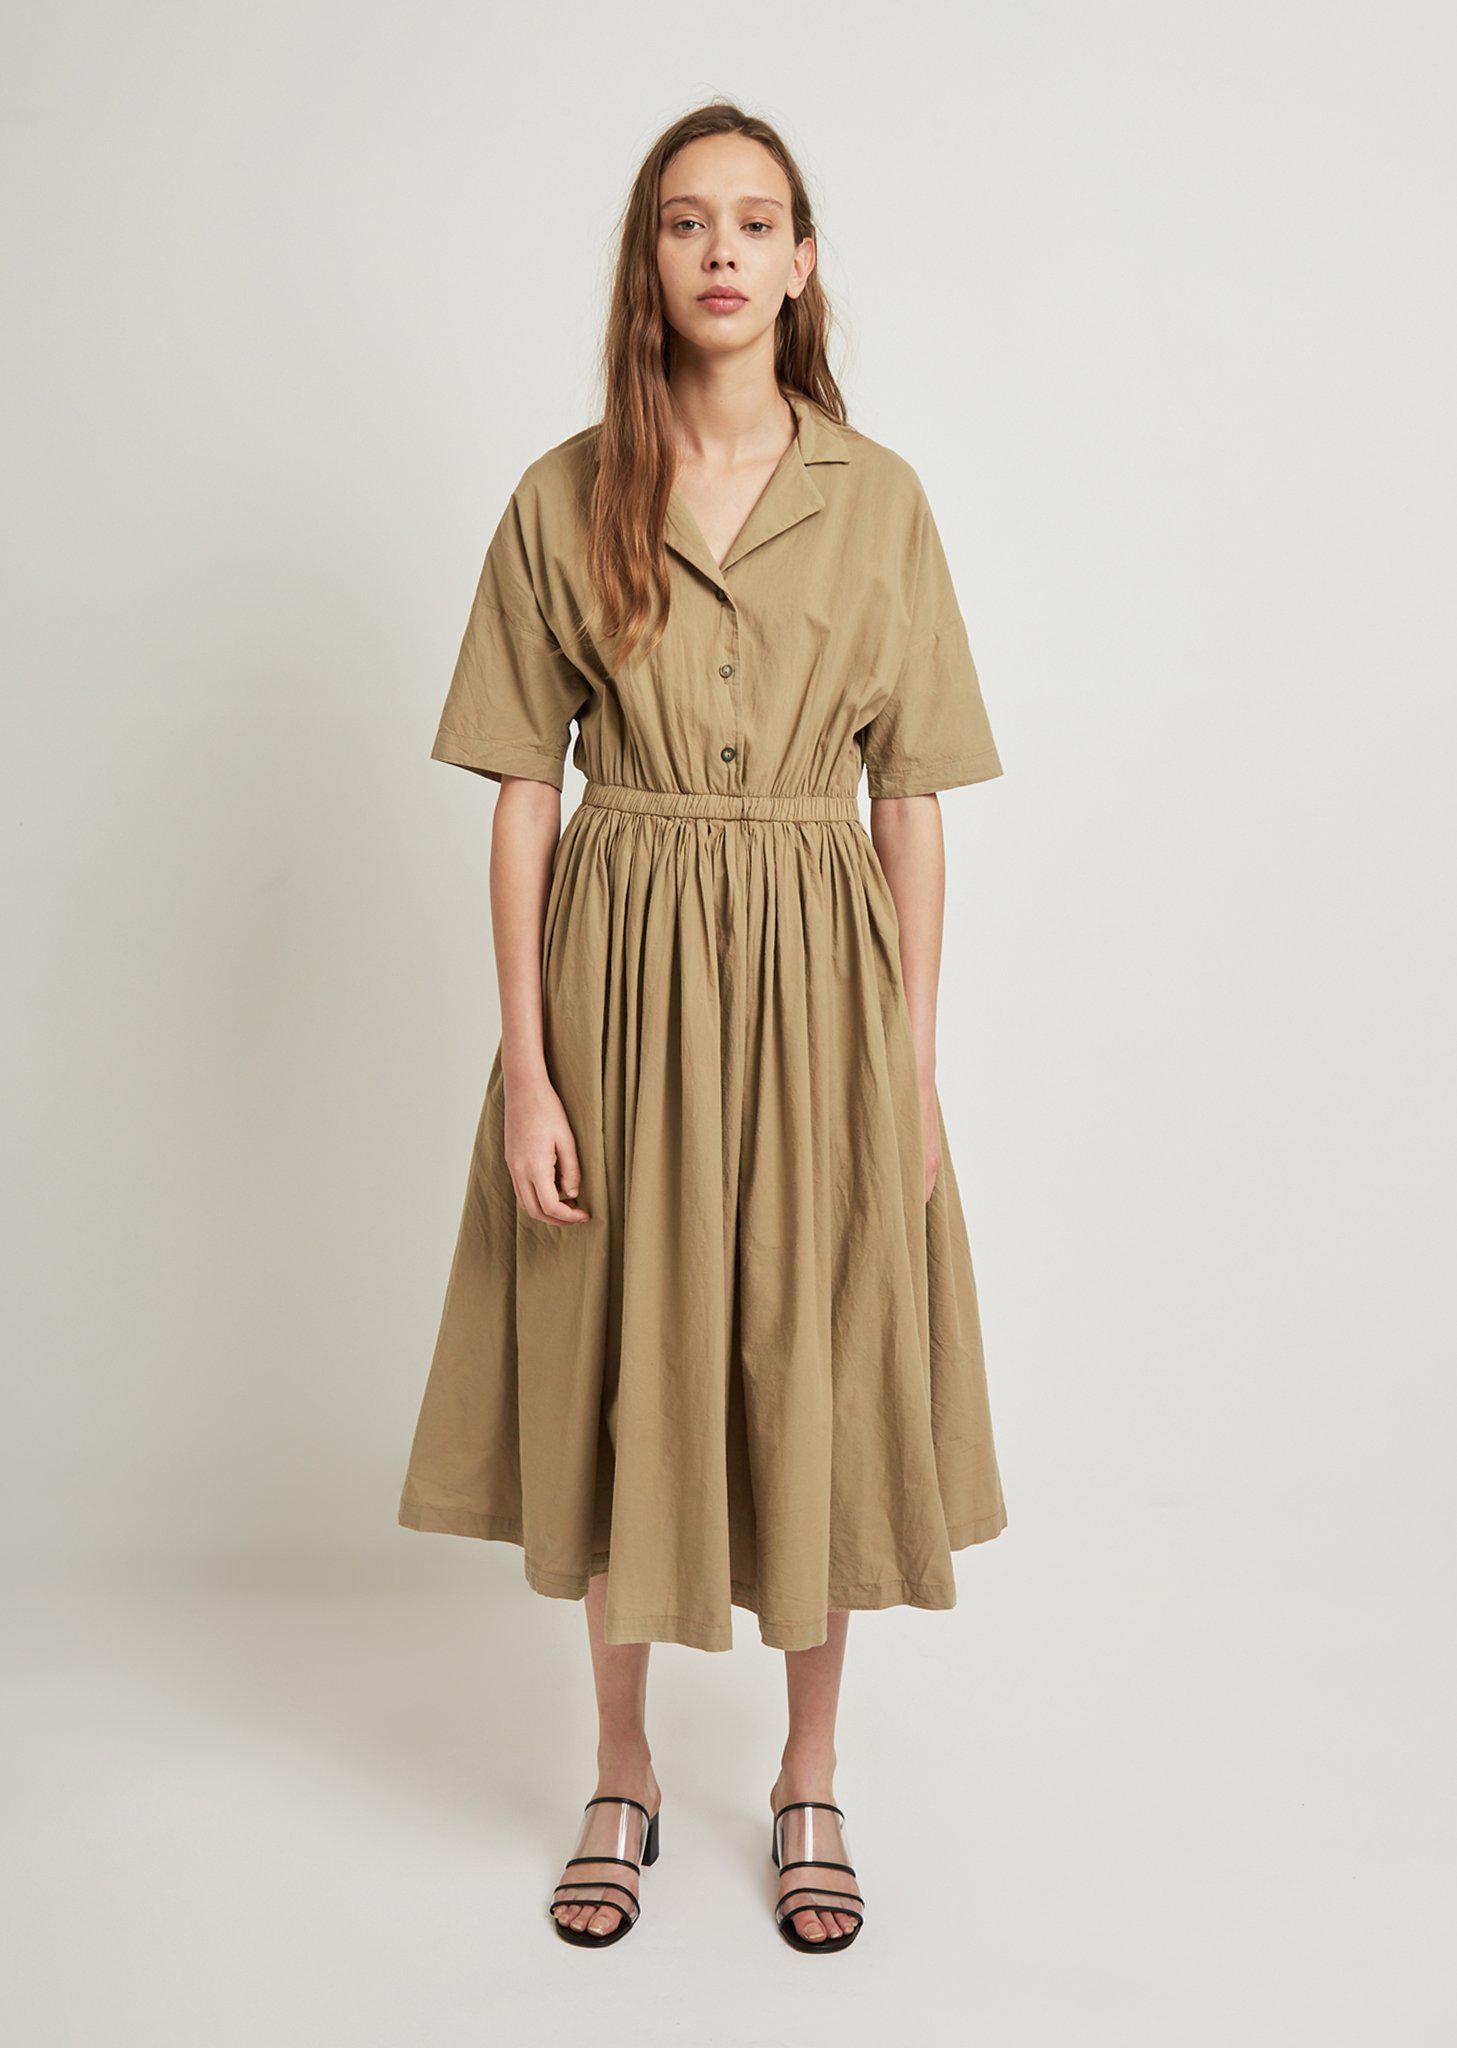 bc9c3a35e85ef Black Crane Natural Classy Short Sleeve Dress